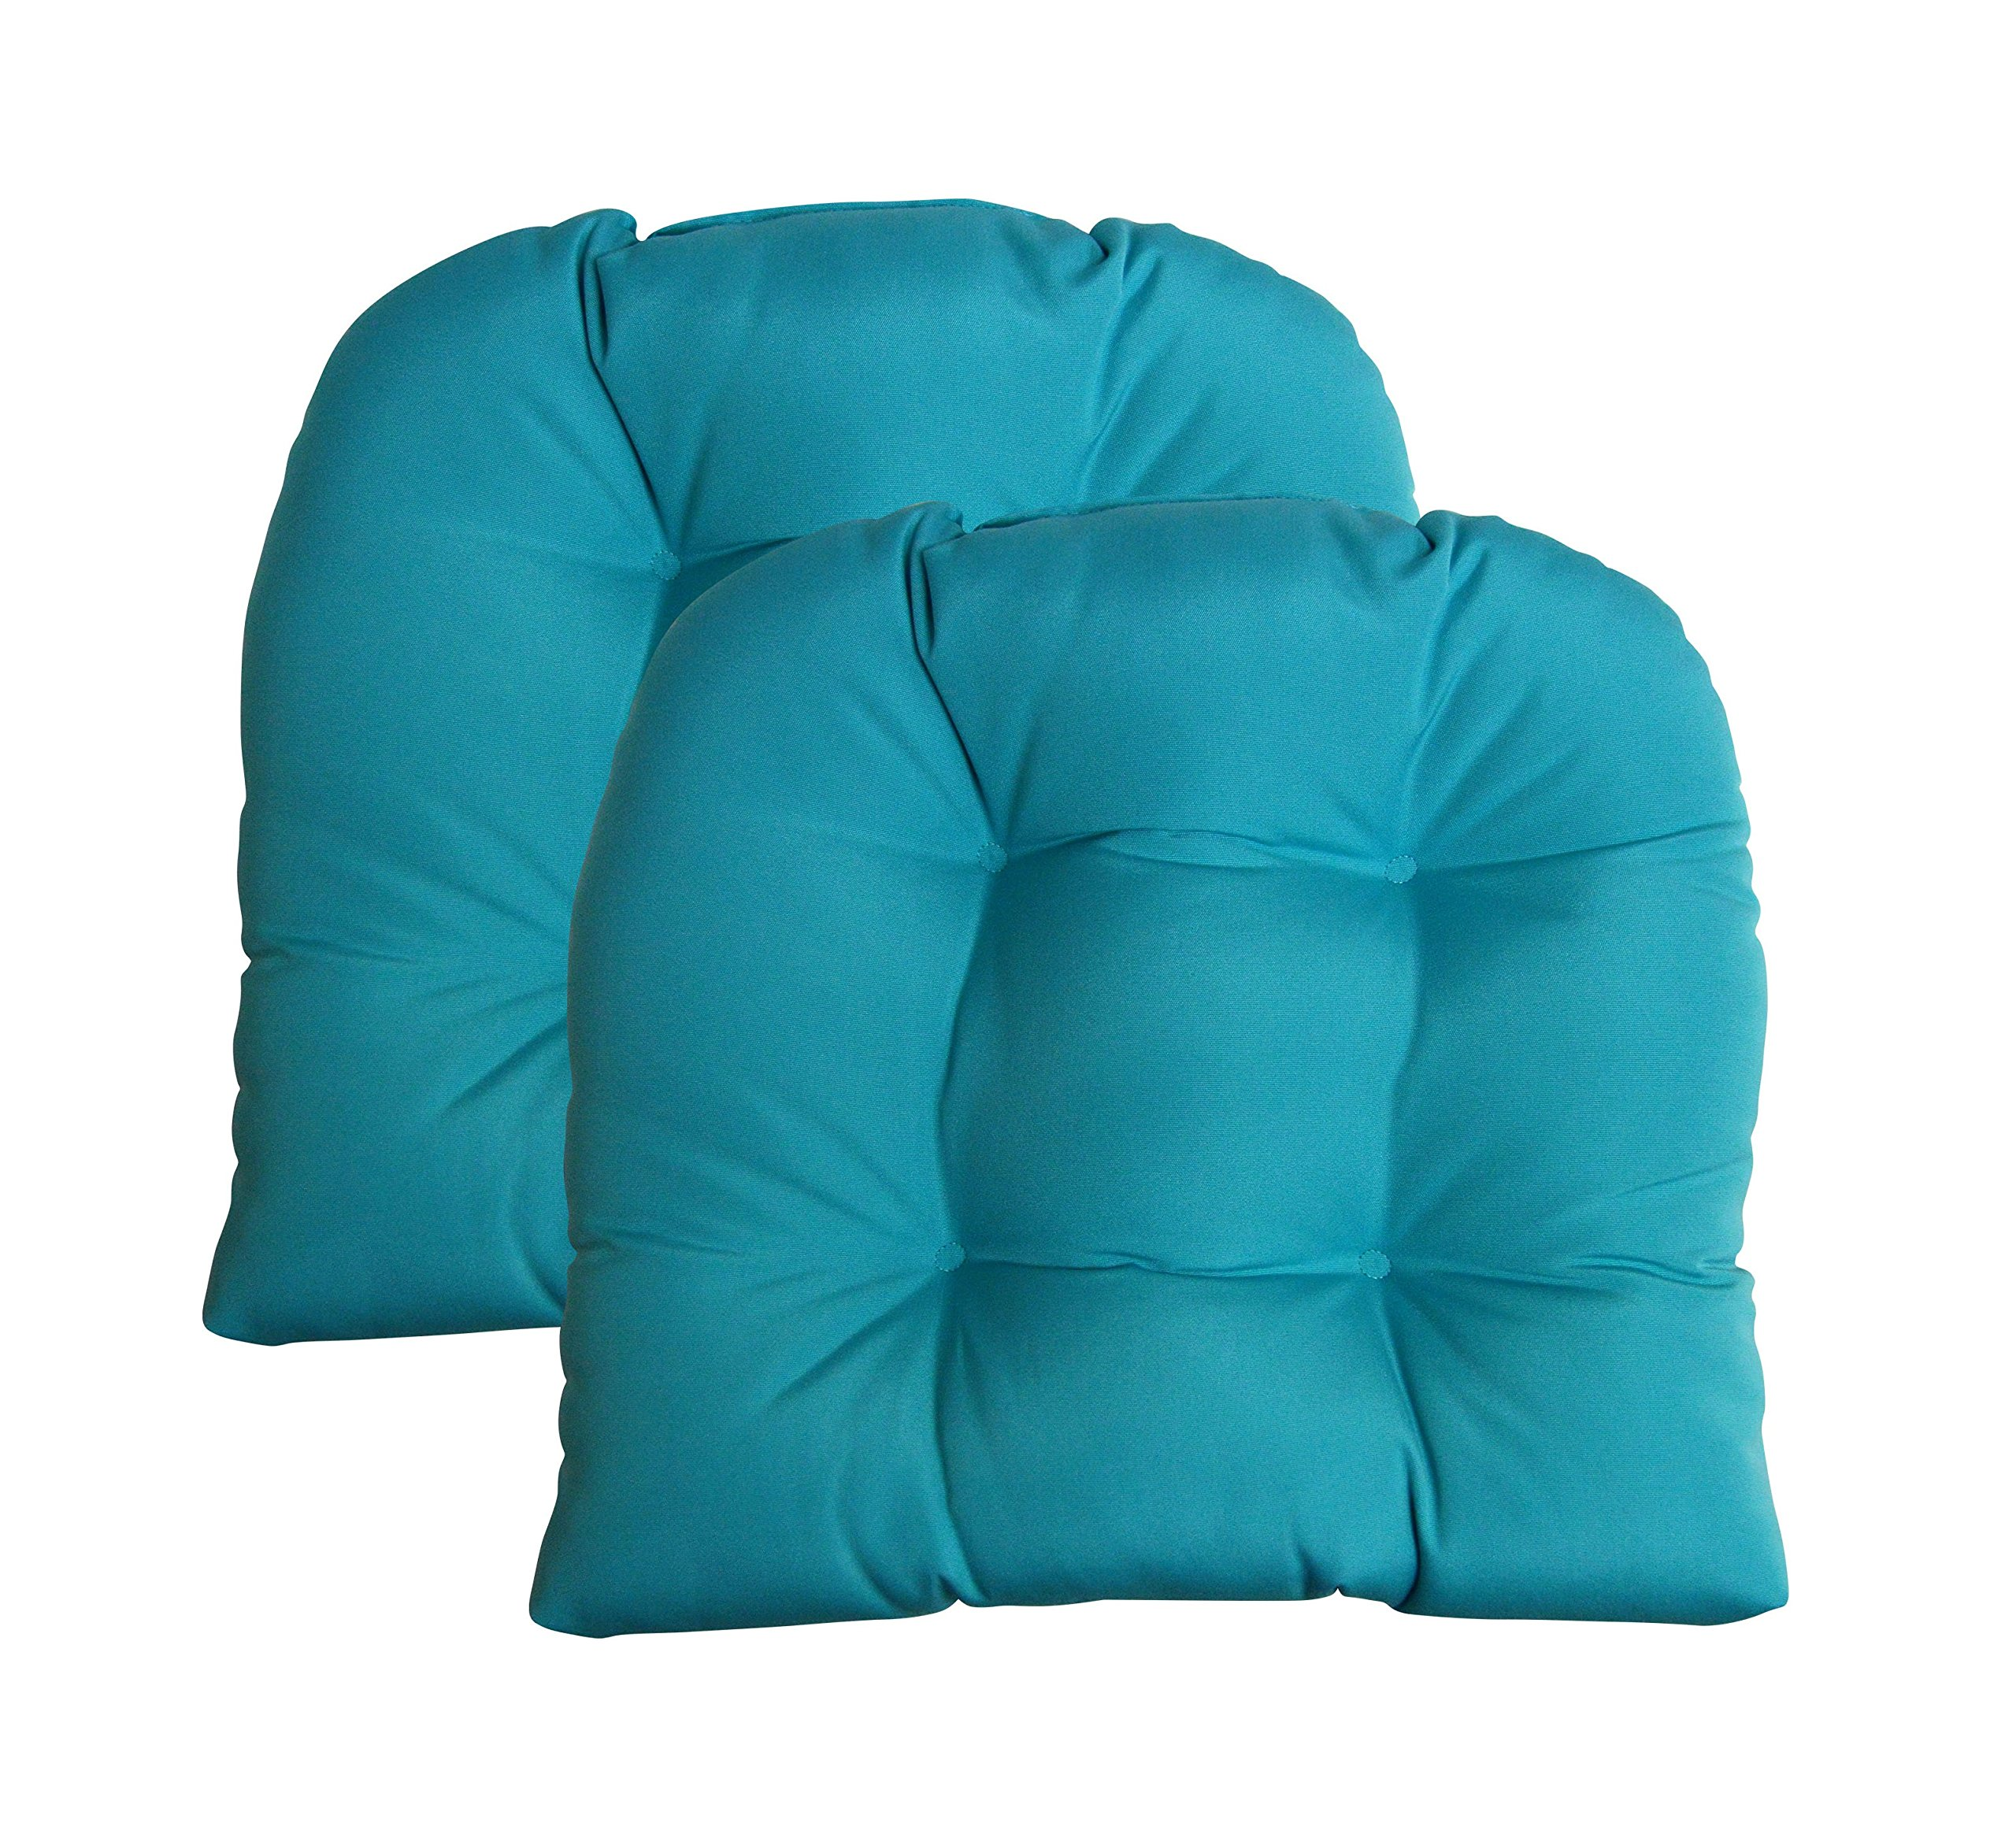 Set of 2 - Universal Tufted U-shape Cushions for Wicker Chair Seat - Sunbrella Canvas Aruba / Turquoise (1125)